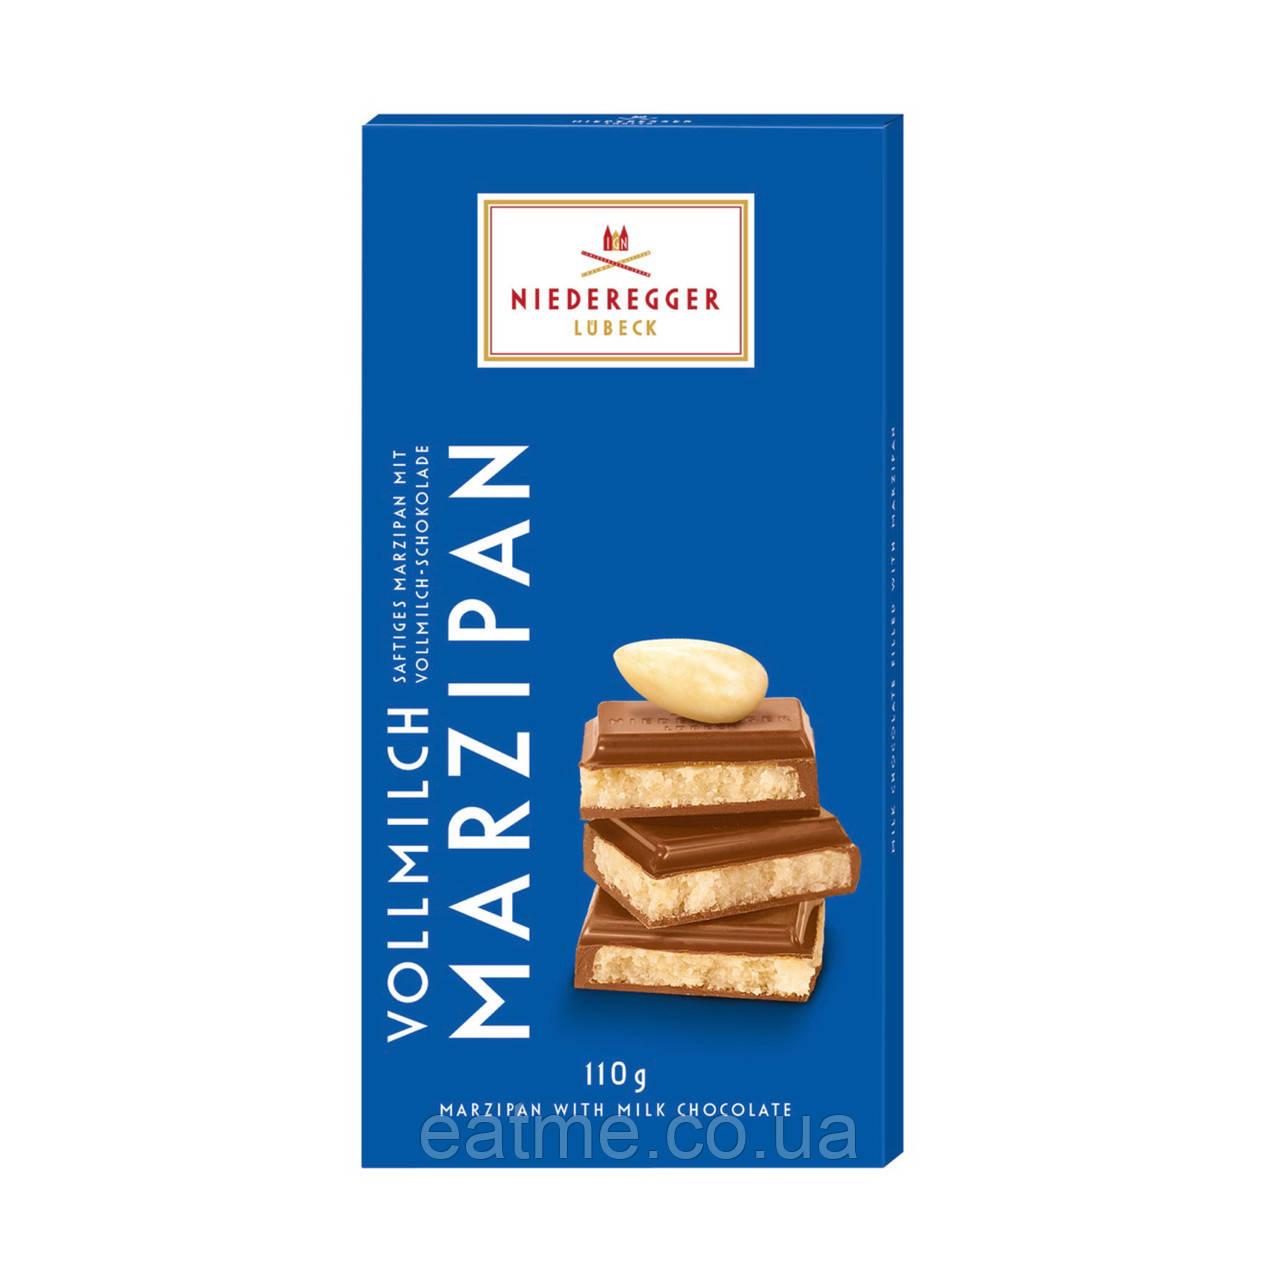 Niederegger Марципан в молочном шоколаде